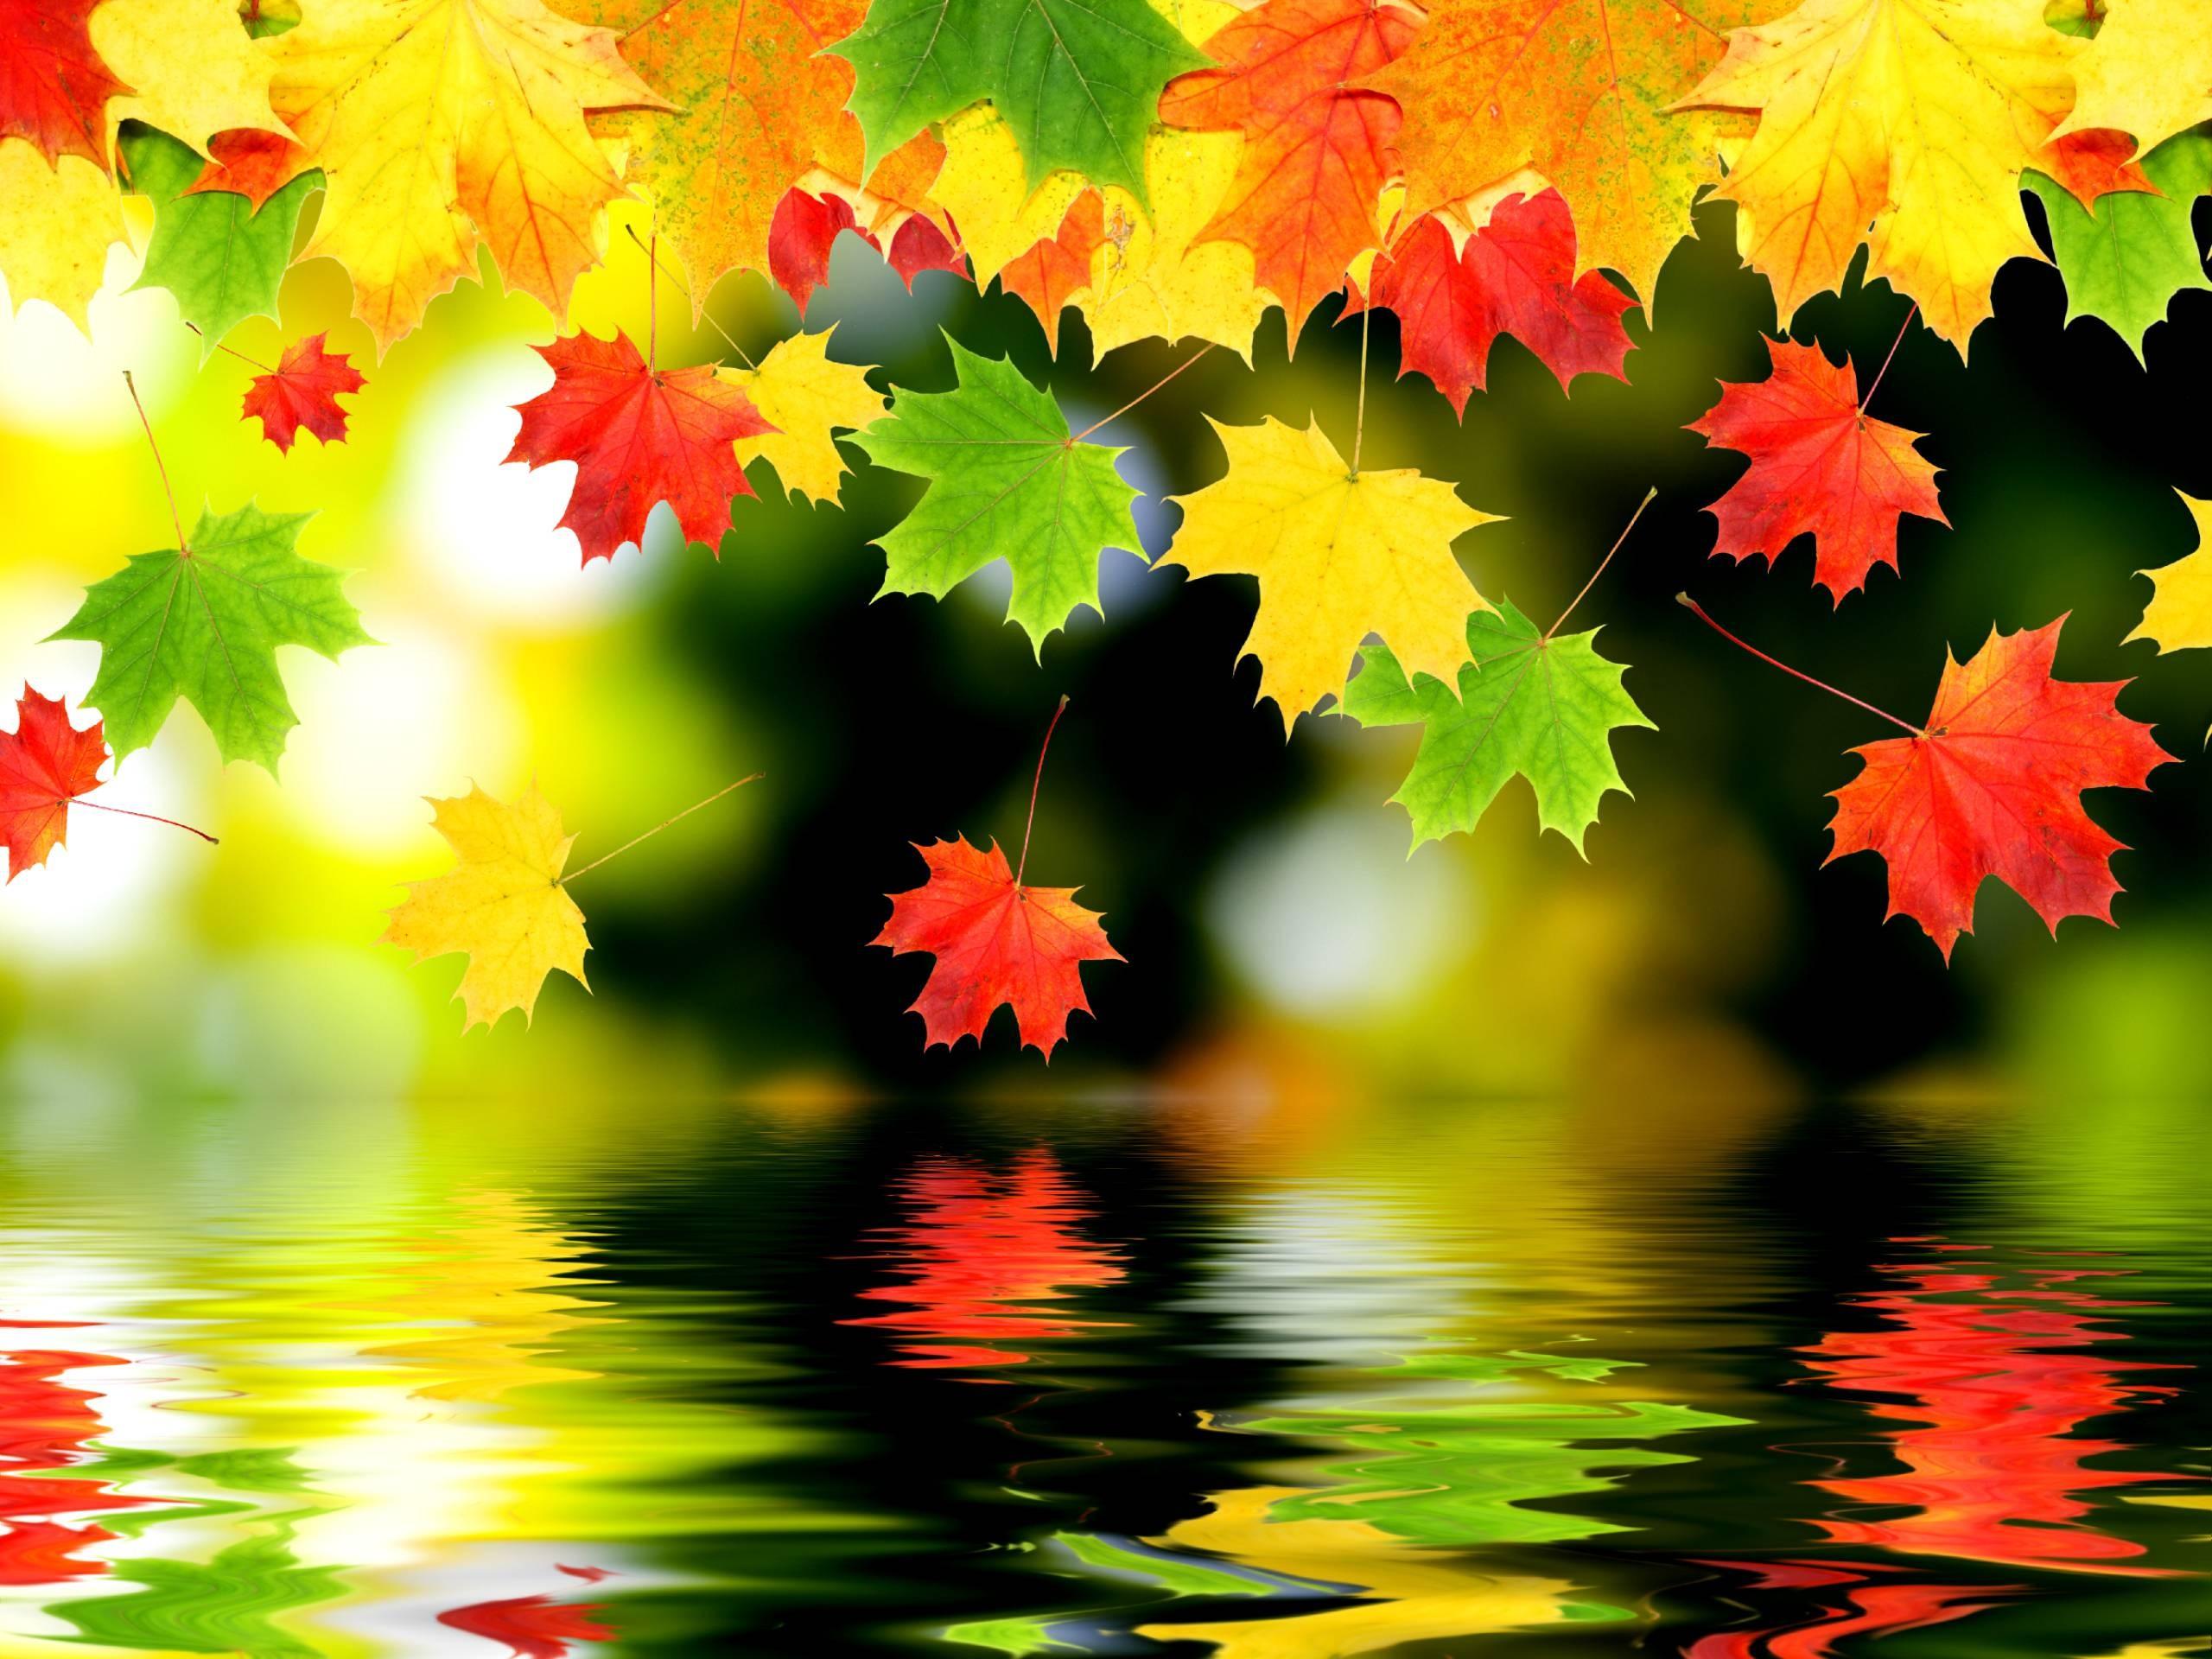 Wallpaper : sunlight, fall, leaves, digital art, water, red, branch ...